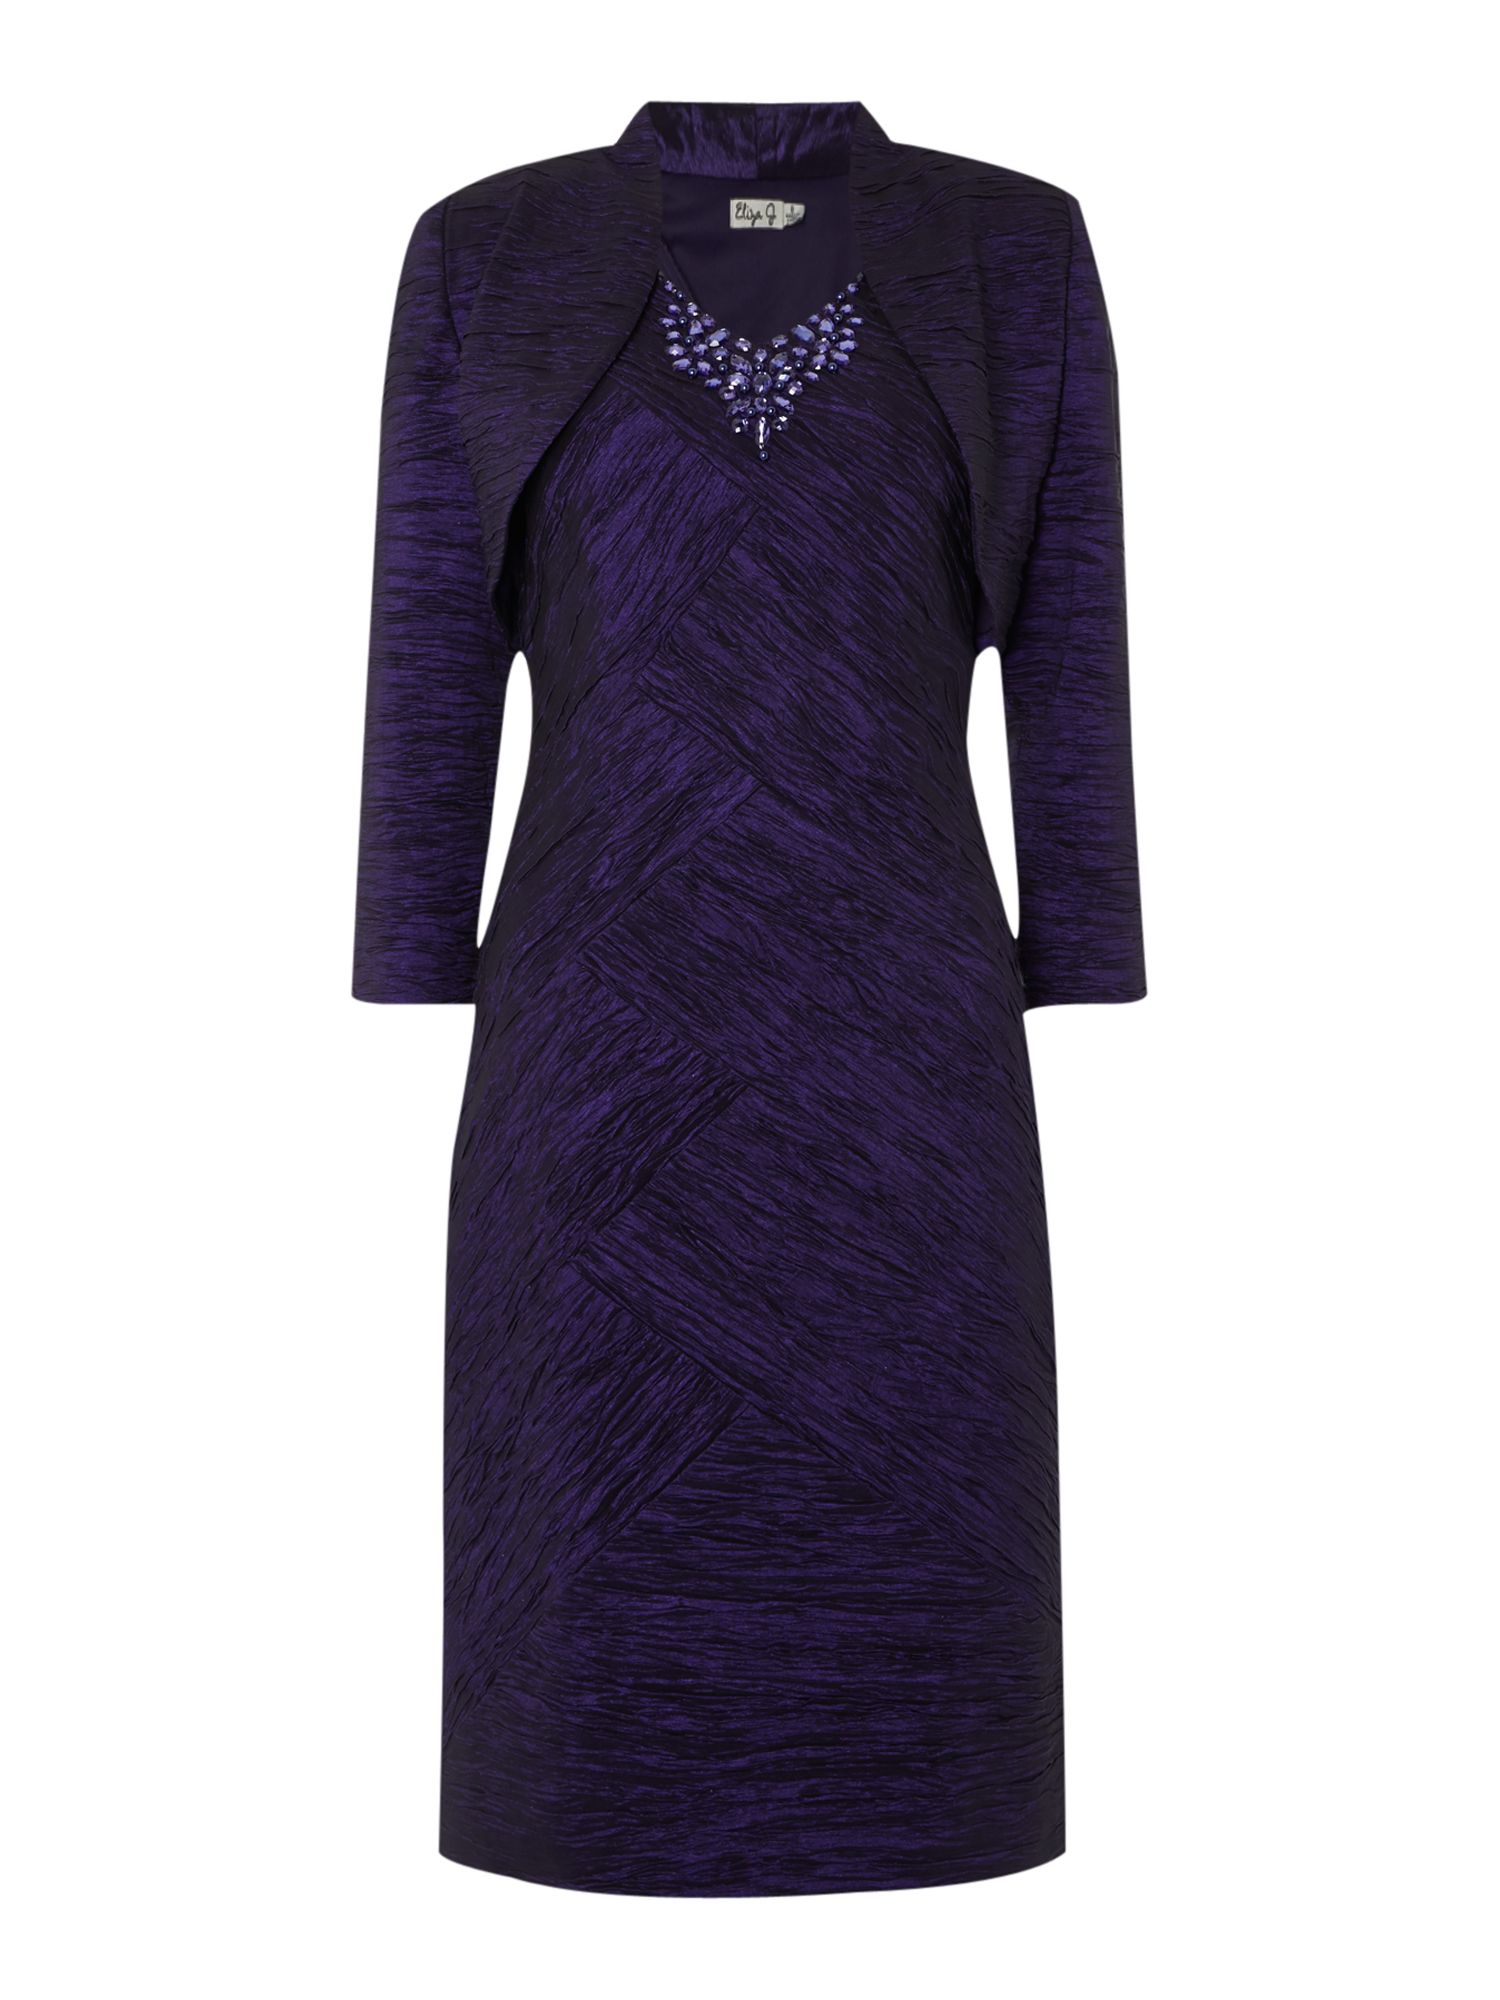 Eliza j Crushed Taff Dress With Jacket in Purple